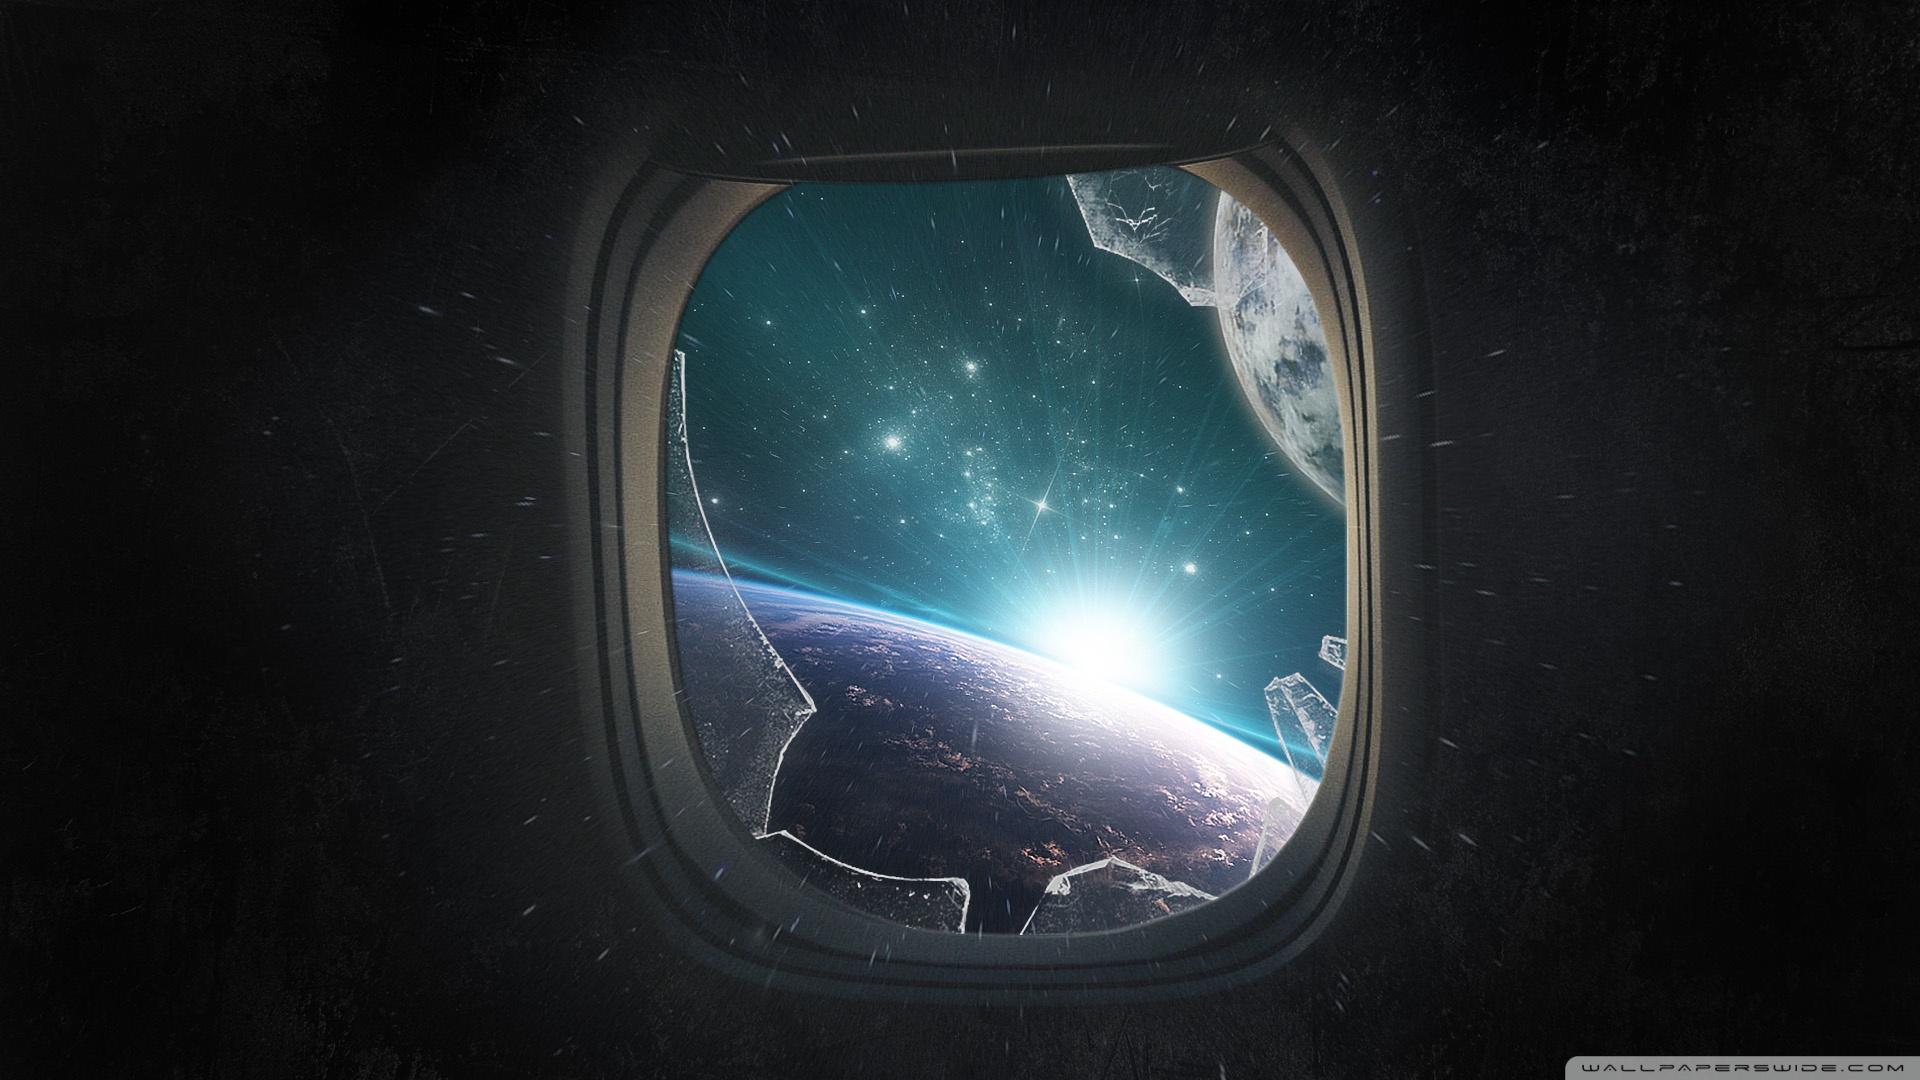 22 Lost In Space Hd Wallpapers On Wallpapersafari